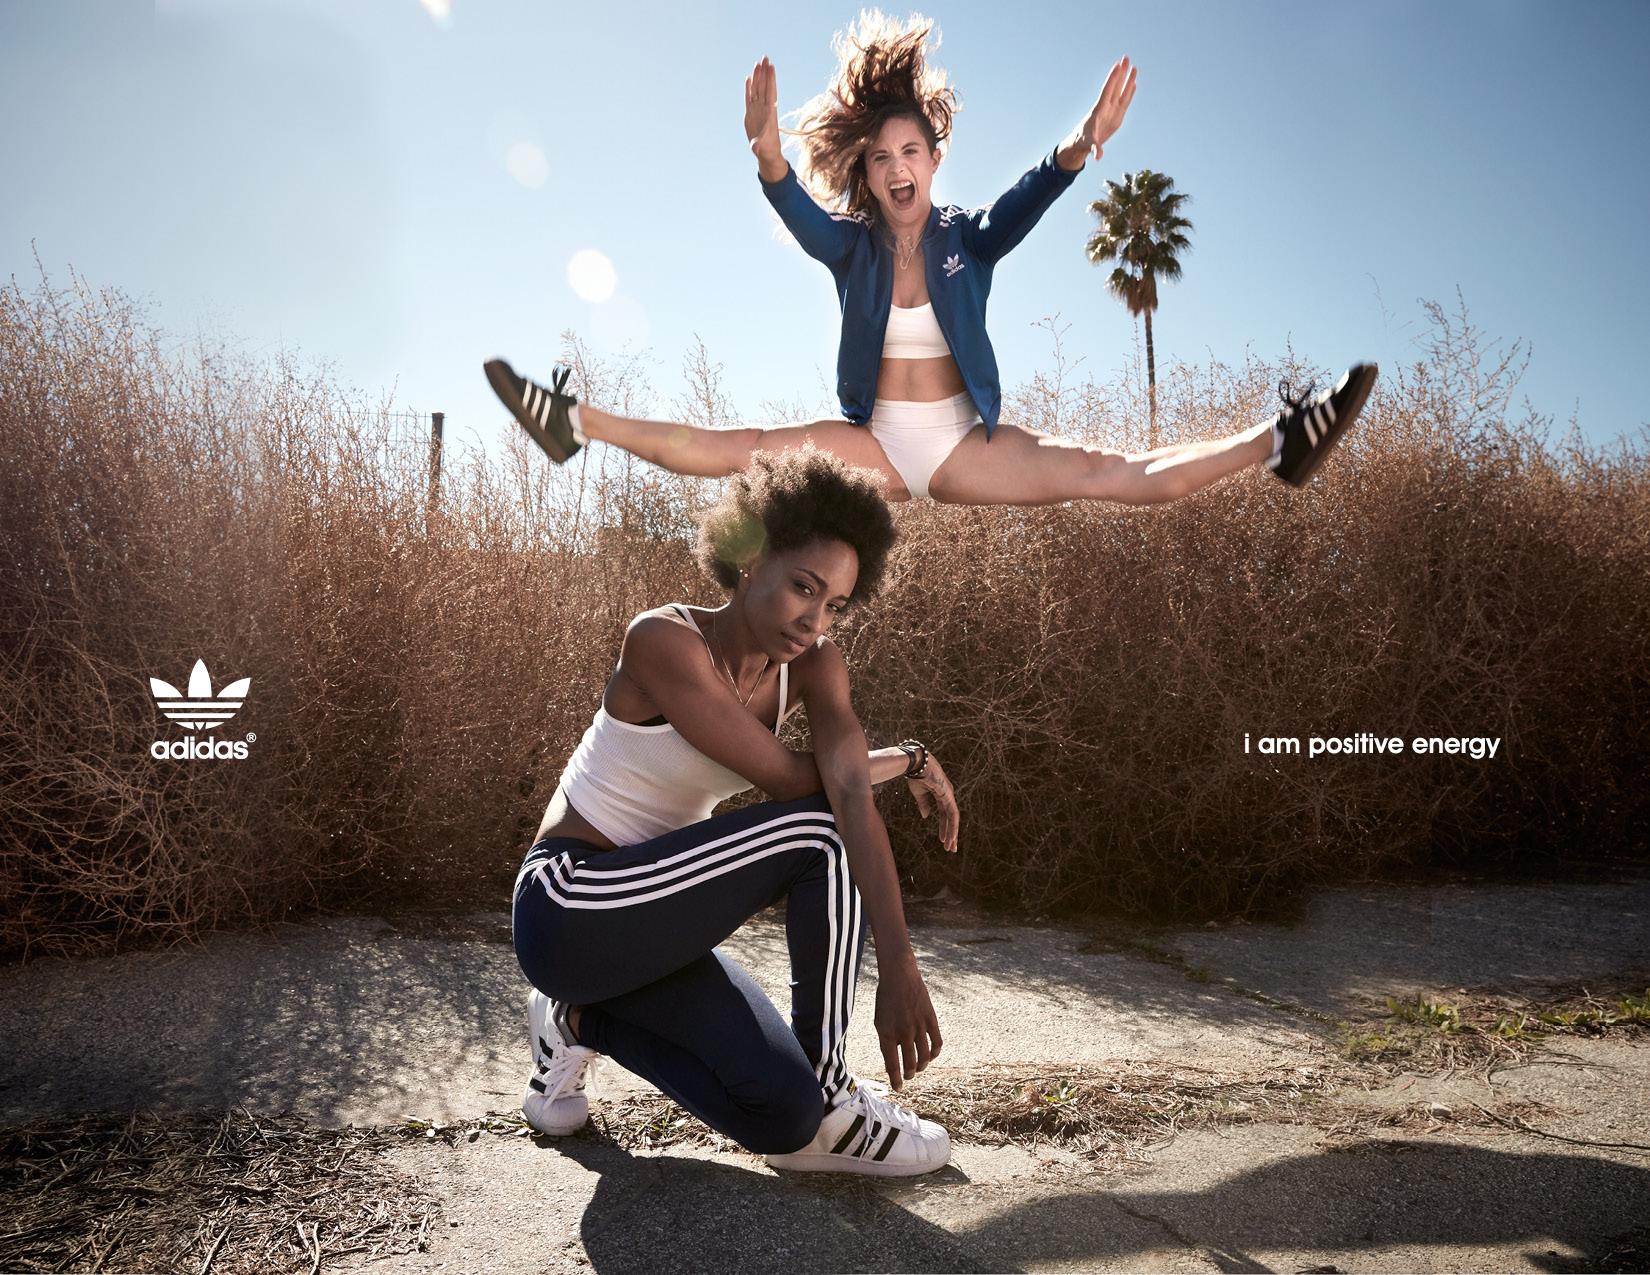 adidas_PROOF1_layouts4.jpg